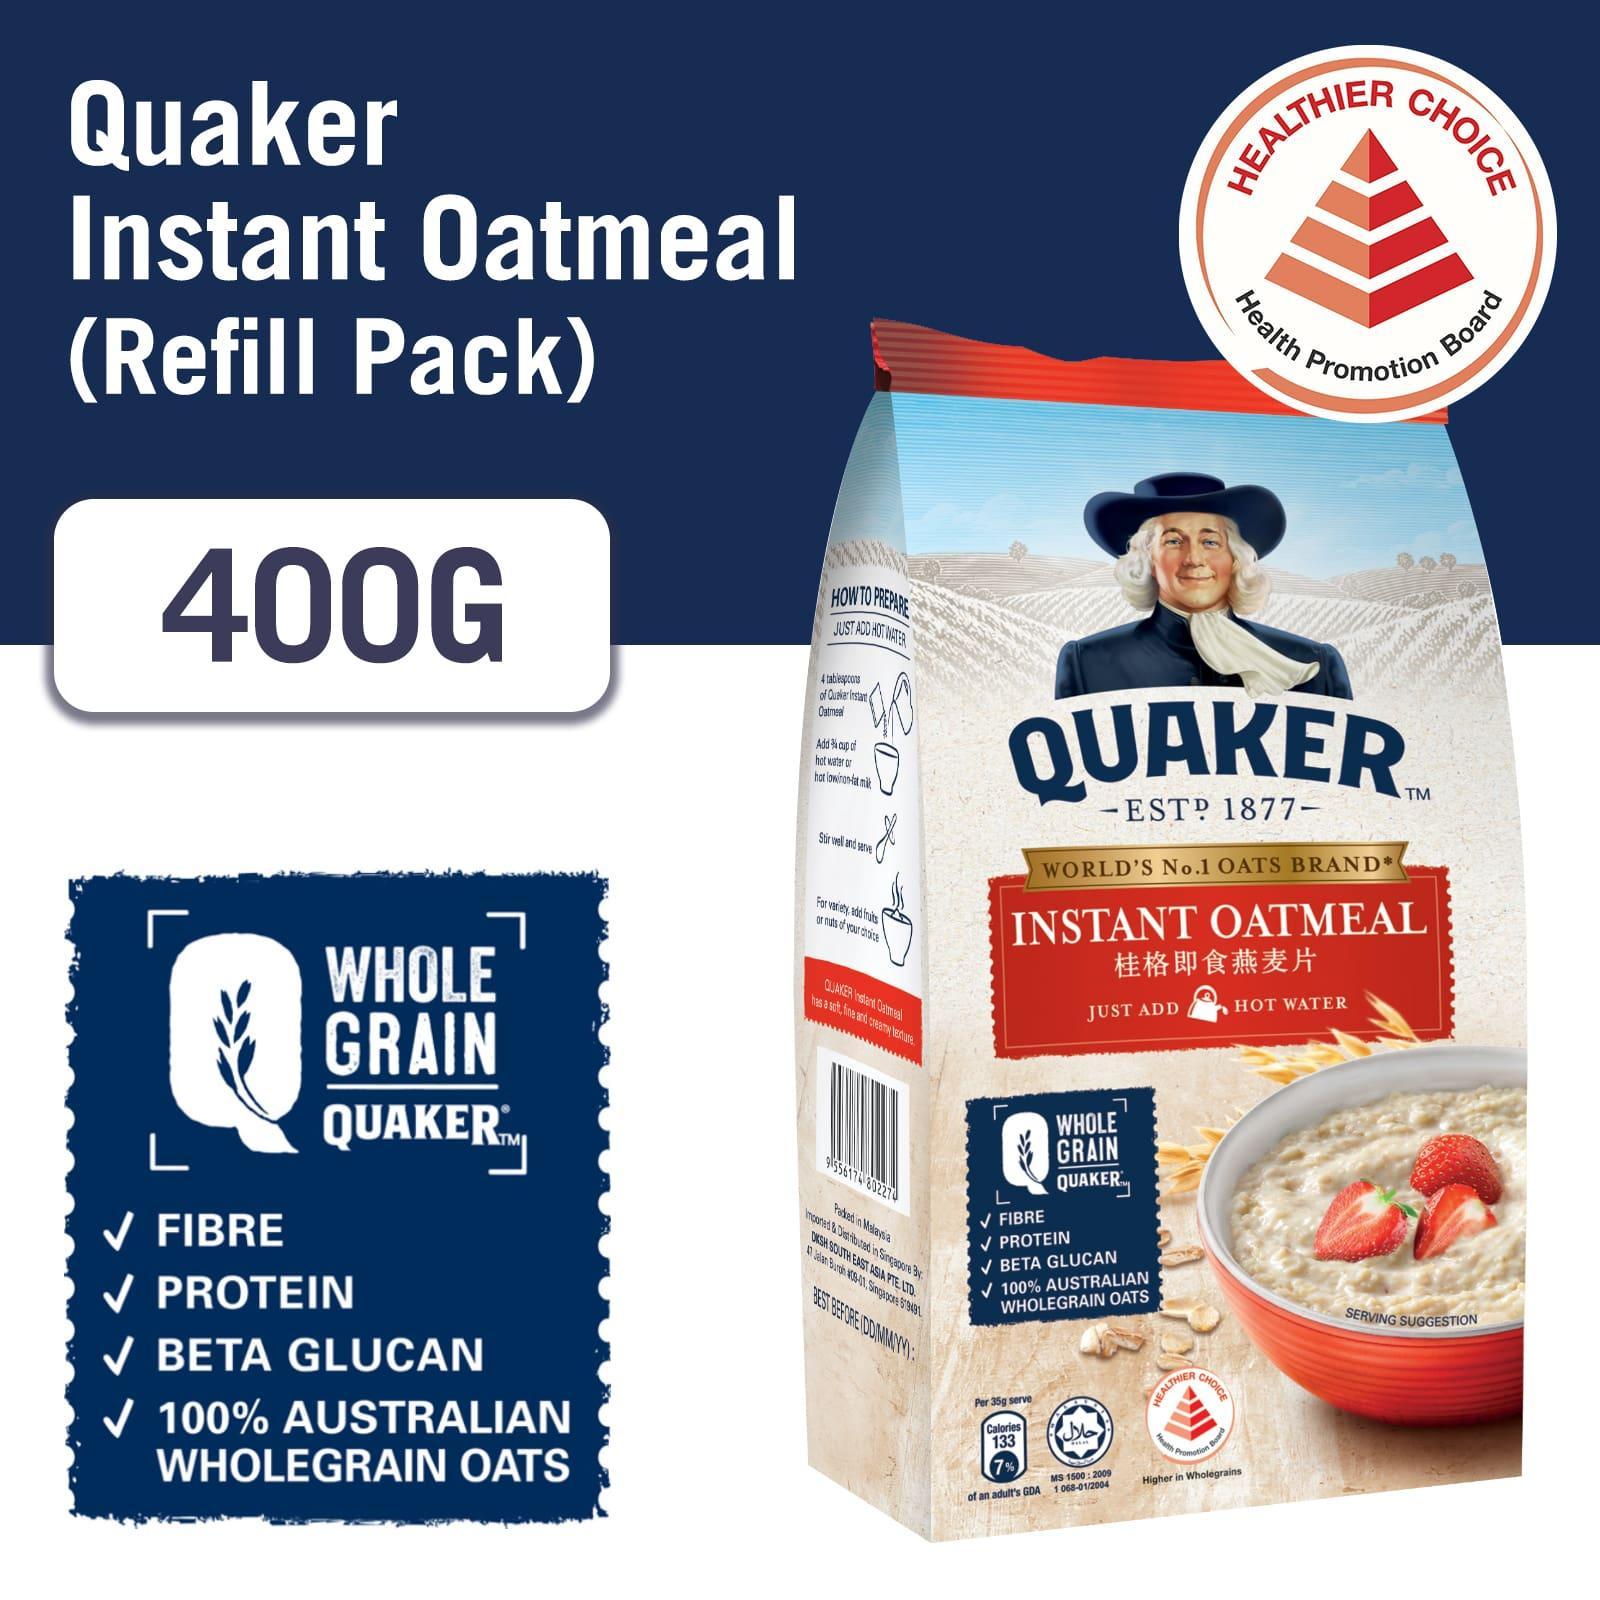 QUAKER Instant Oatmeal Refill 400g